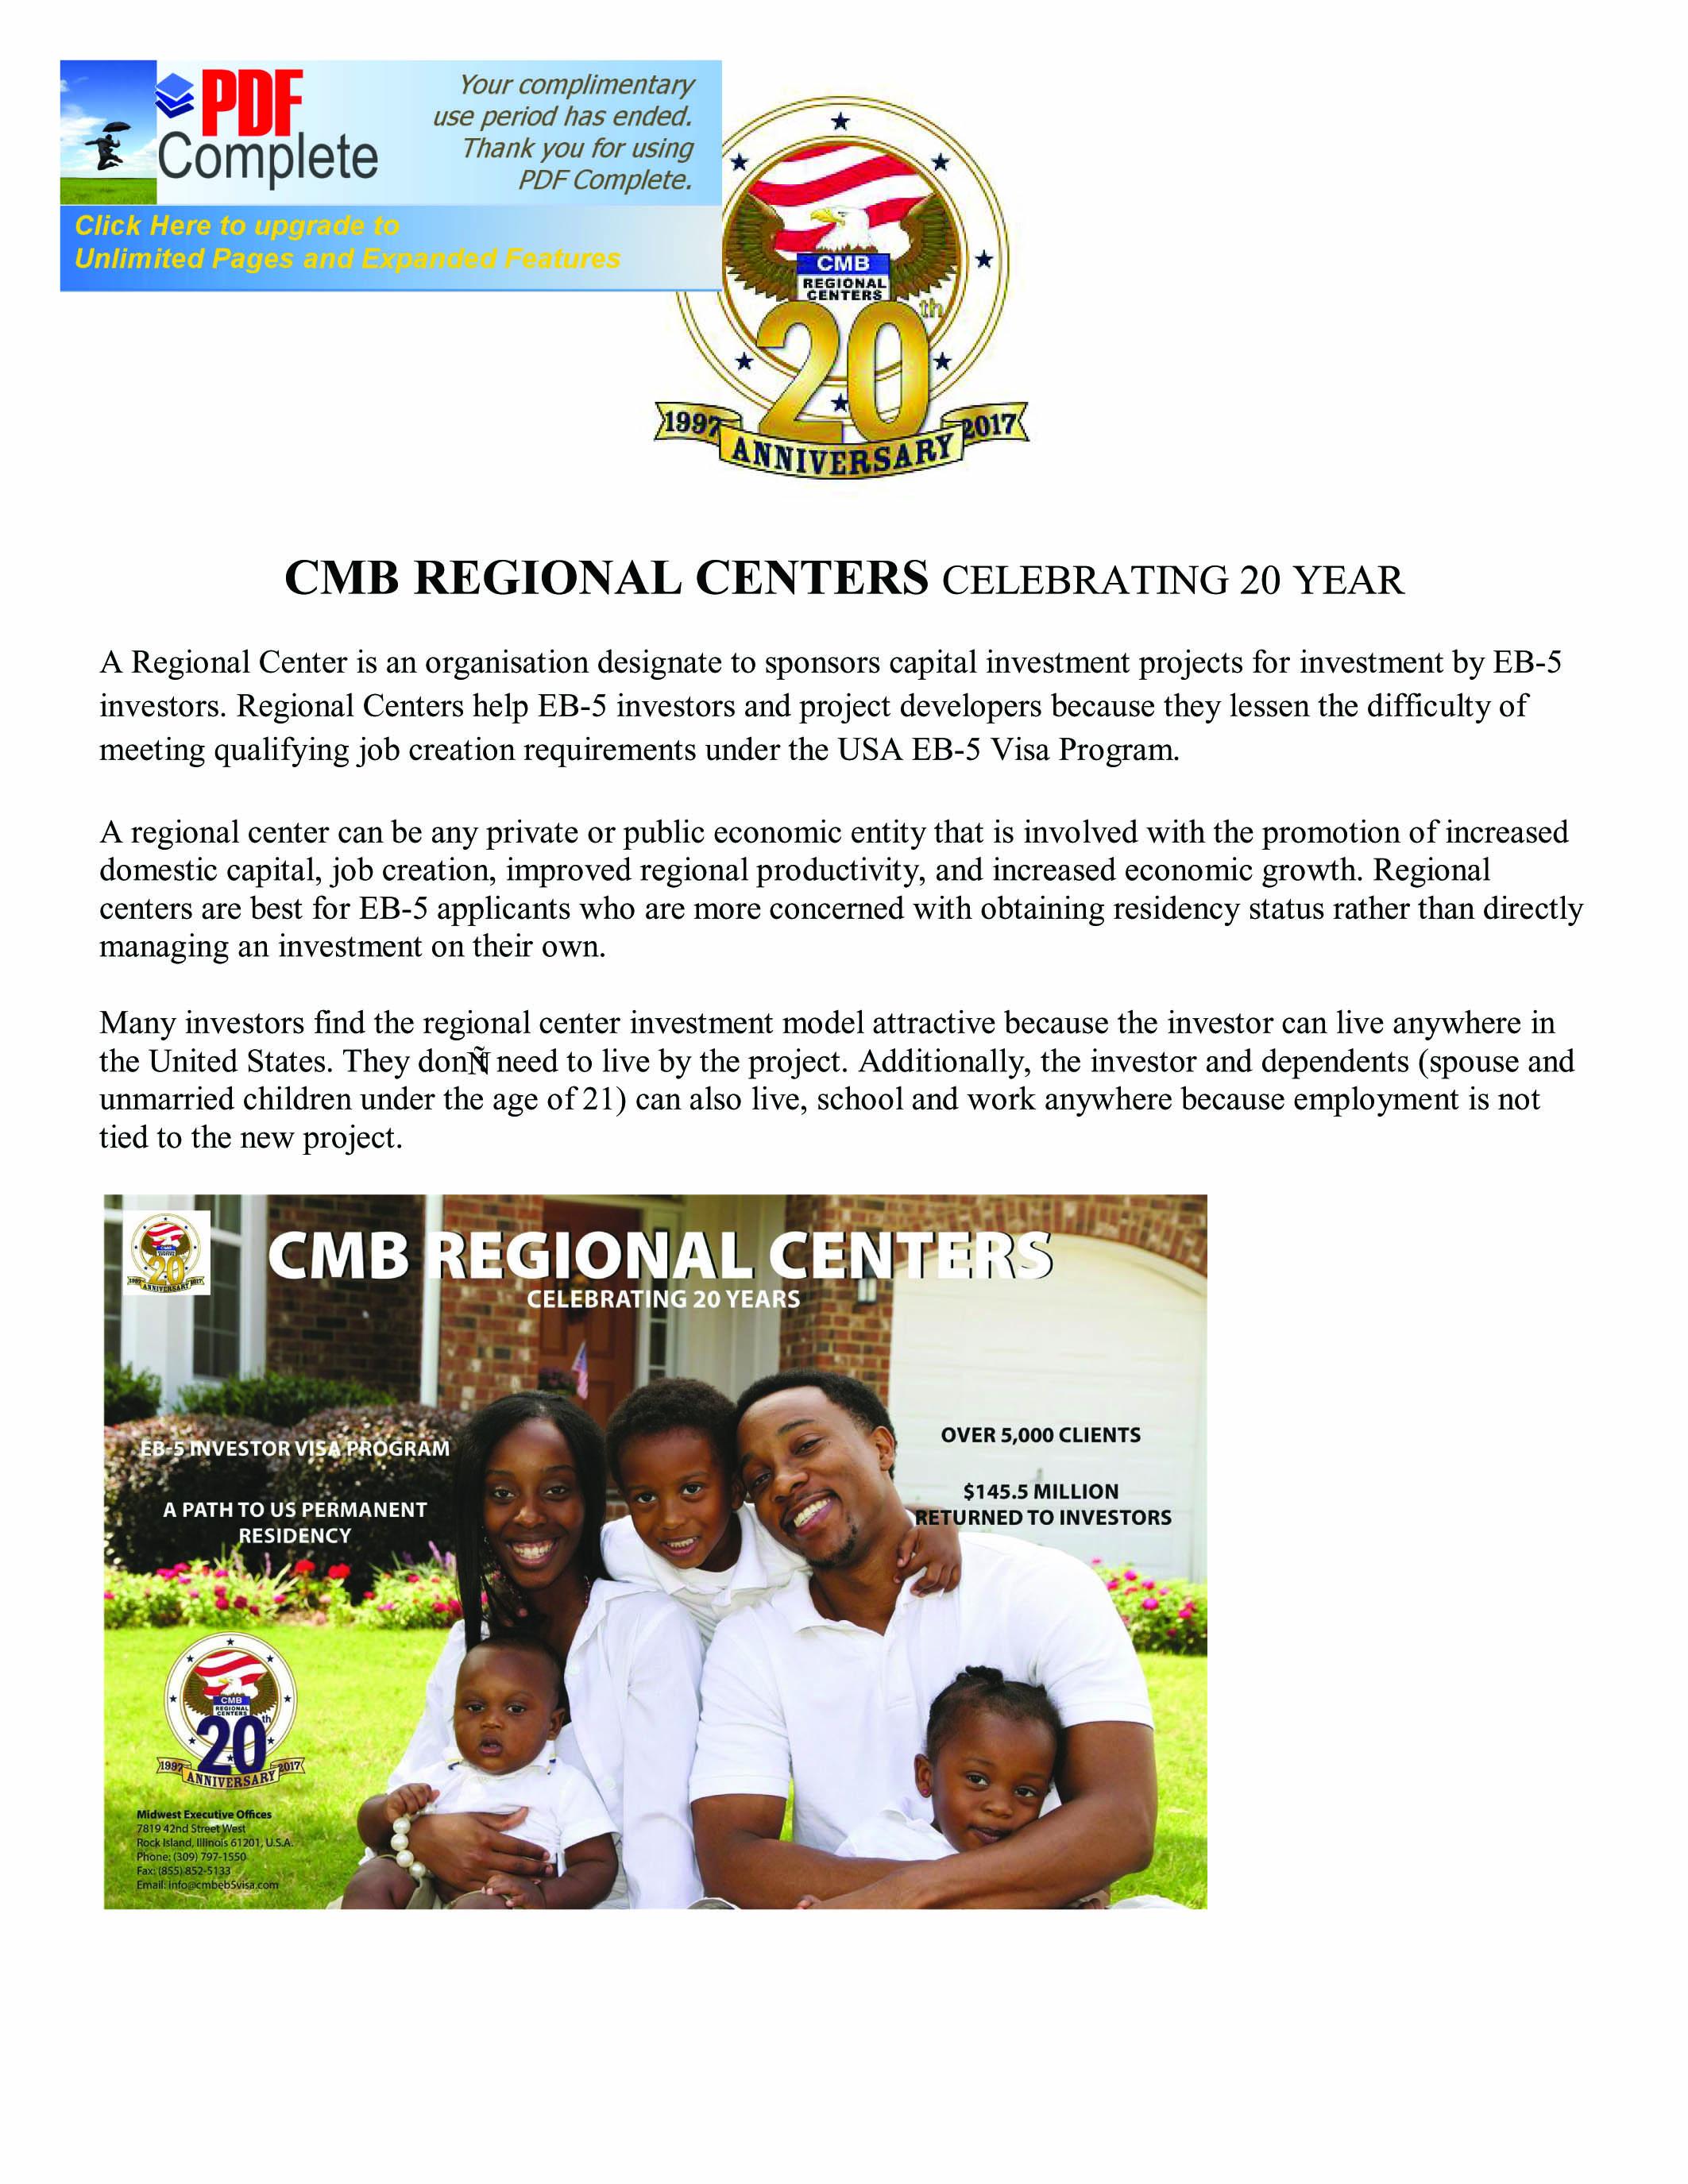 CMB Regional Centers Sponsored Article1 copy